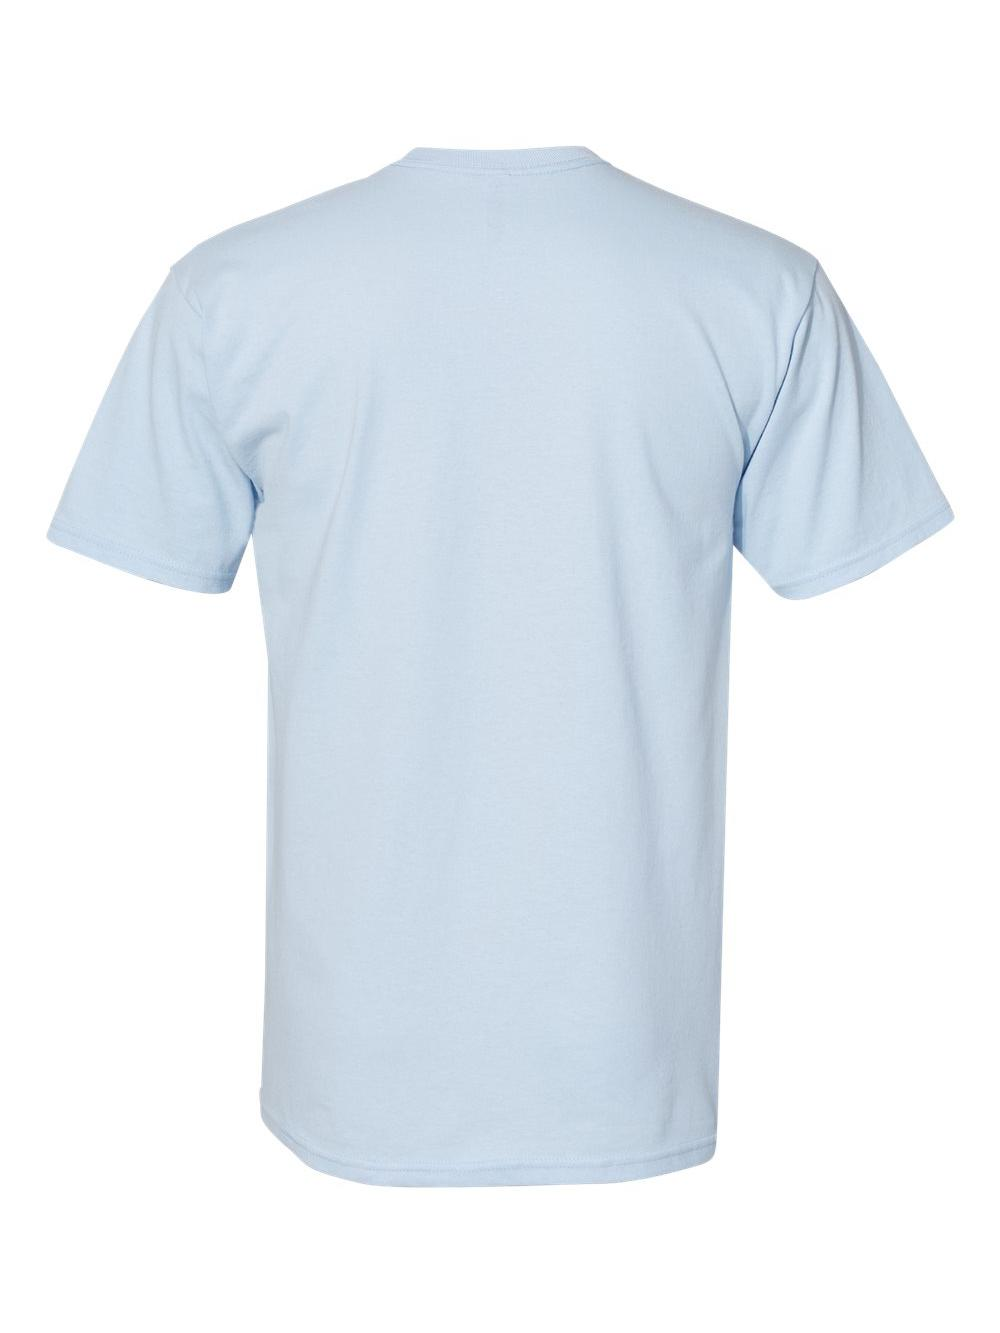 ALSTYLE-Premium-T-Shirt-1701 thumbnail 41